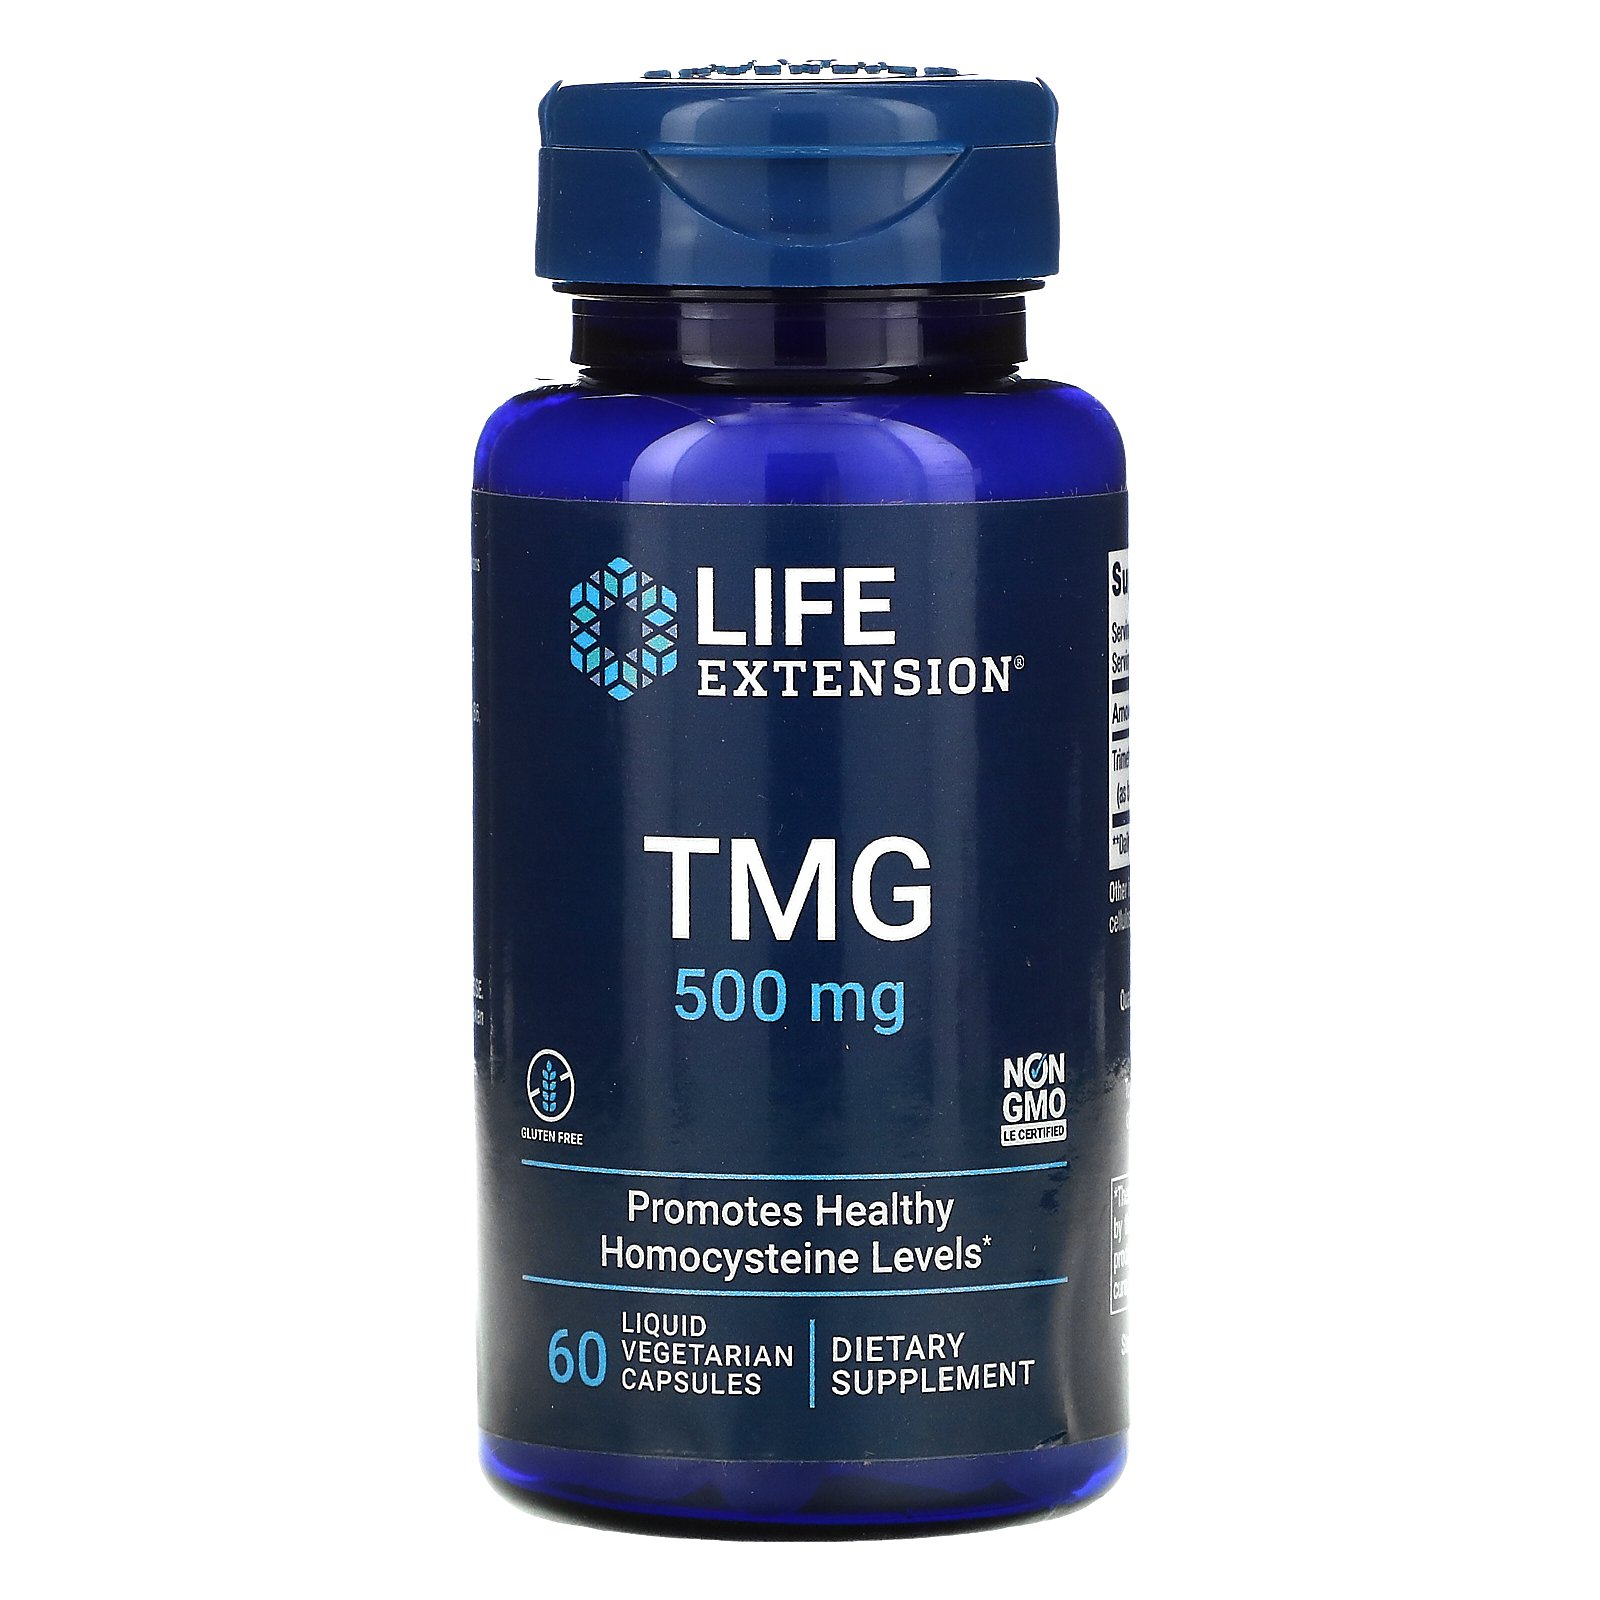 Life Extension, TMG, триметилглицин, 500 мг, 60 вегетарианских капсул с жидкостью